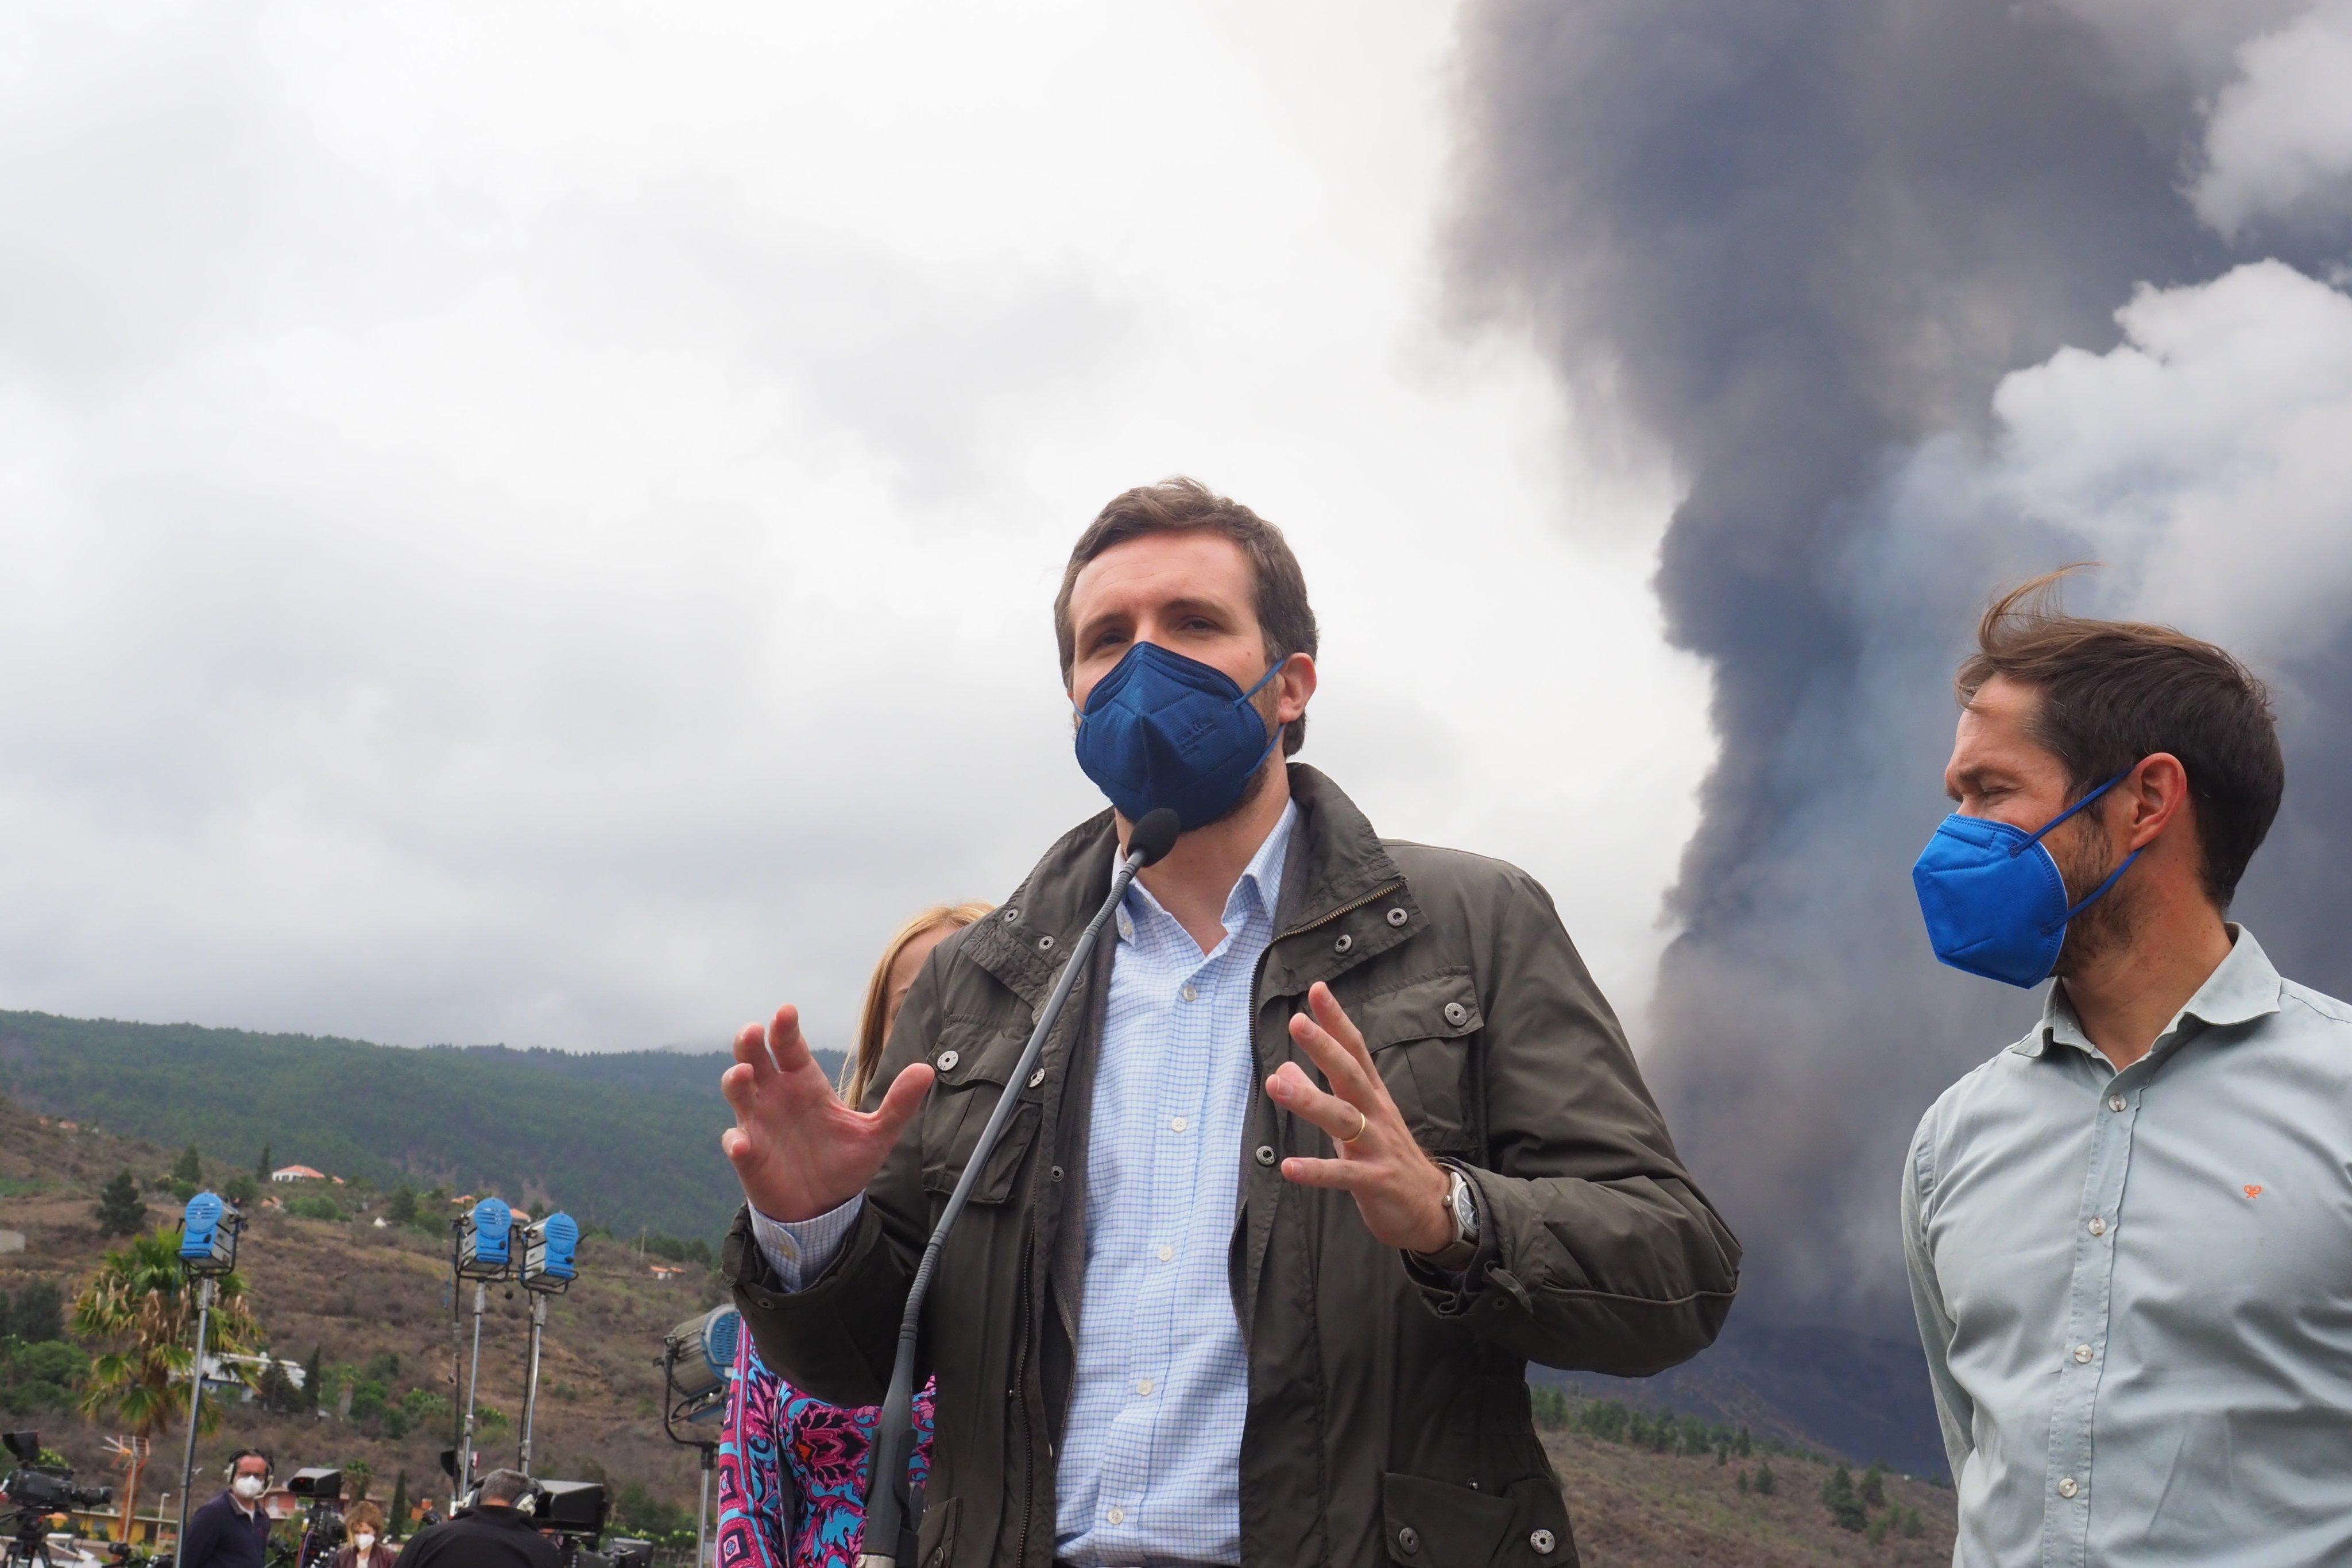 Pablo Casado (pp) Visits La Palma Due To The Eruption Of The Cumbre Vieja Volcano